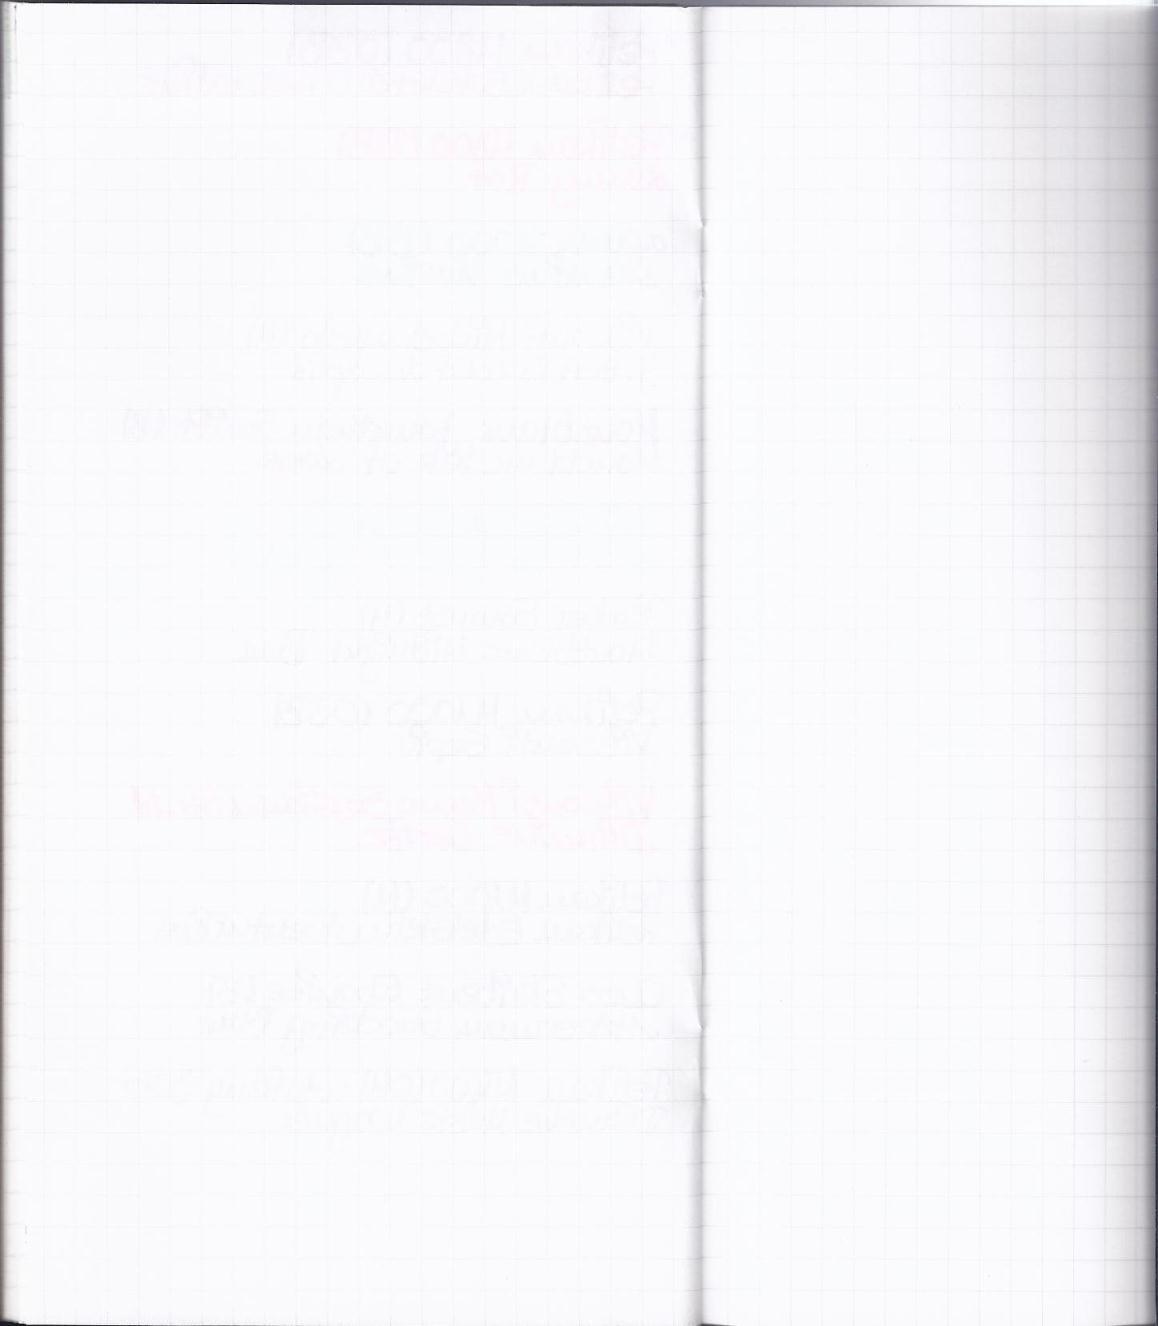 Midori Travelers Notebook Scan 2